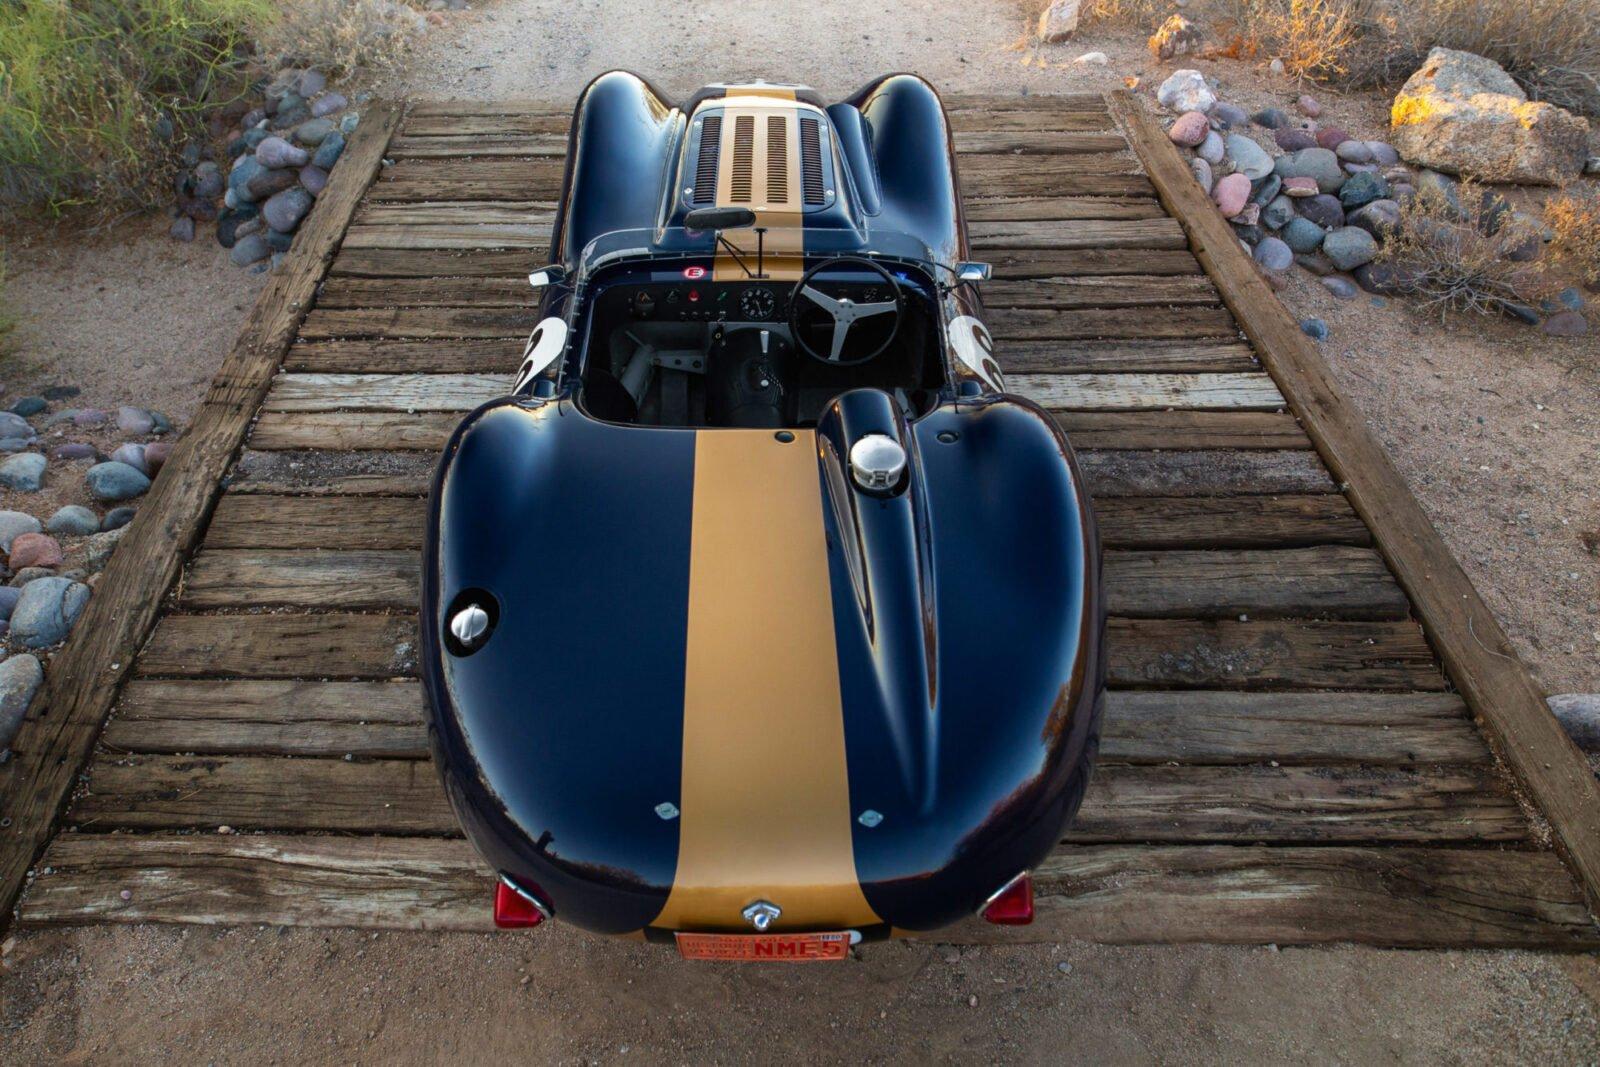 Lister-Jaguar Knobbly 4